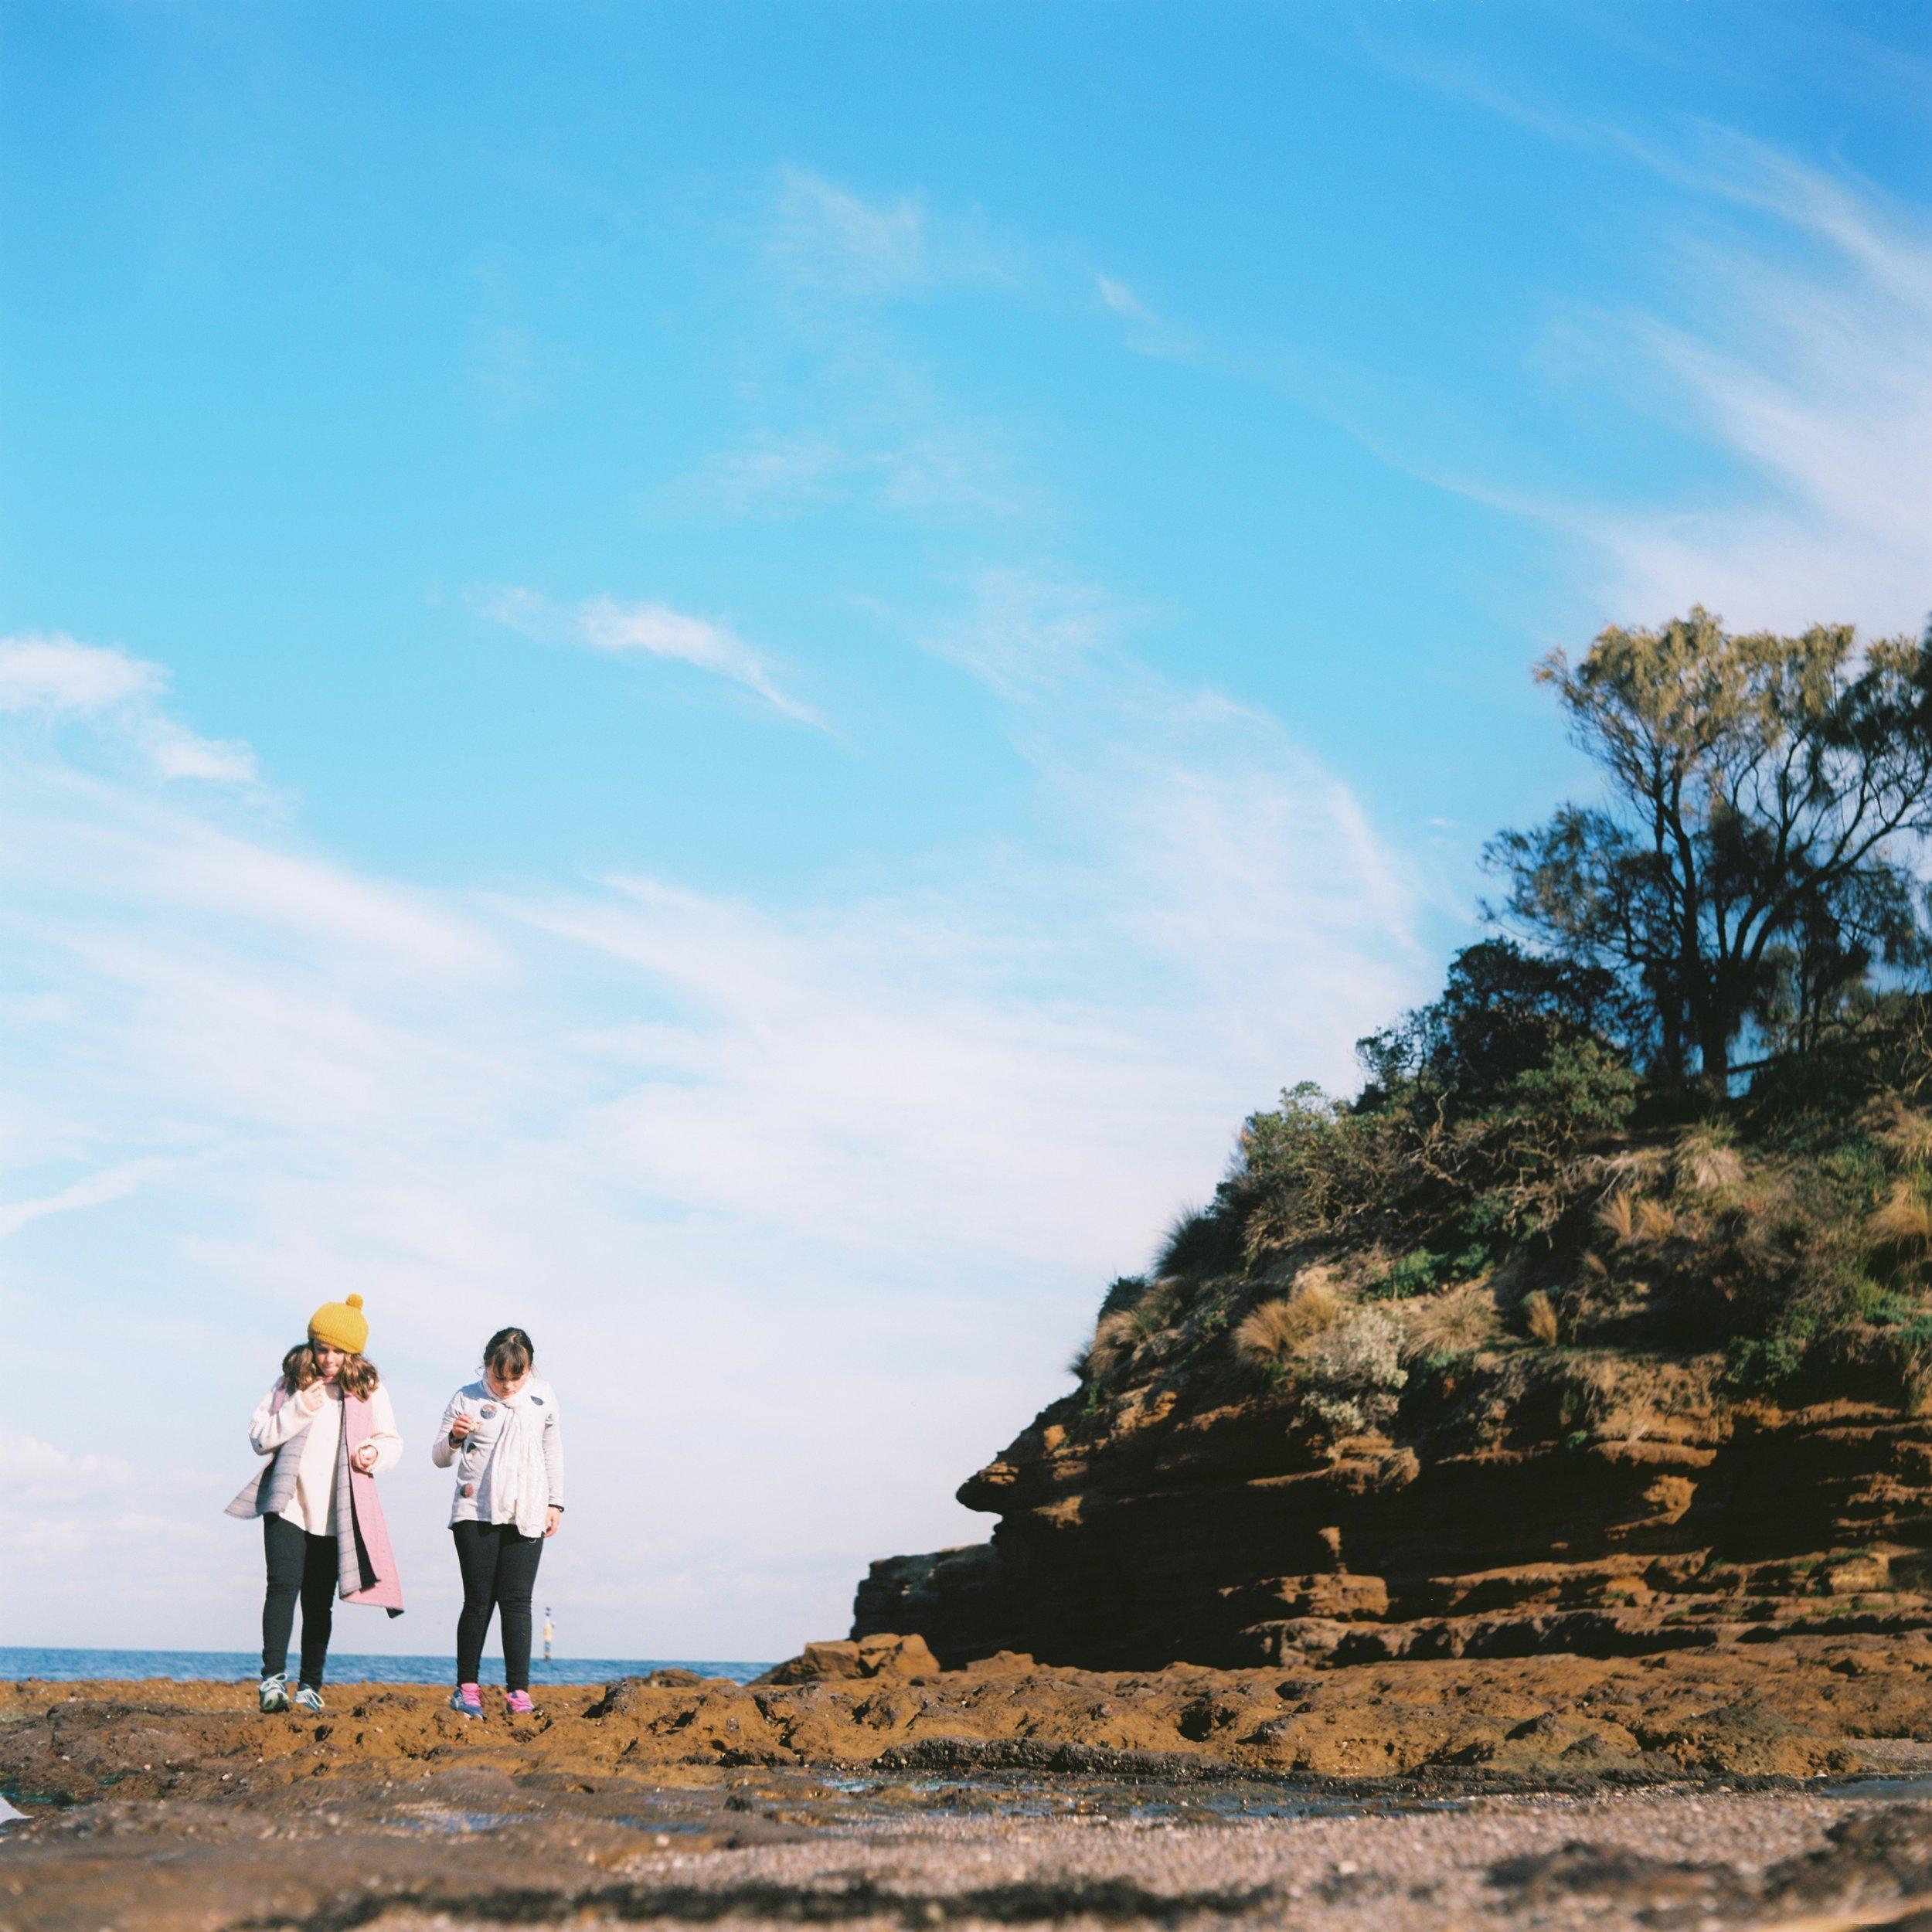 sandringham beach walk and trail walk with children